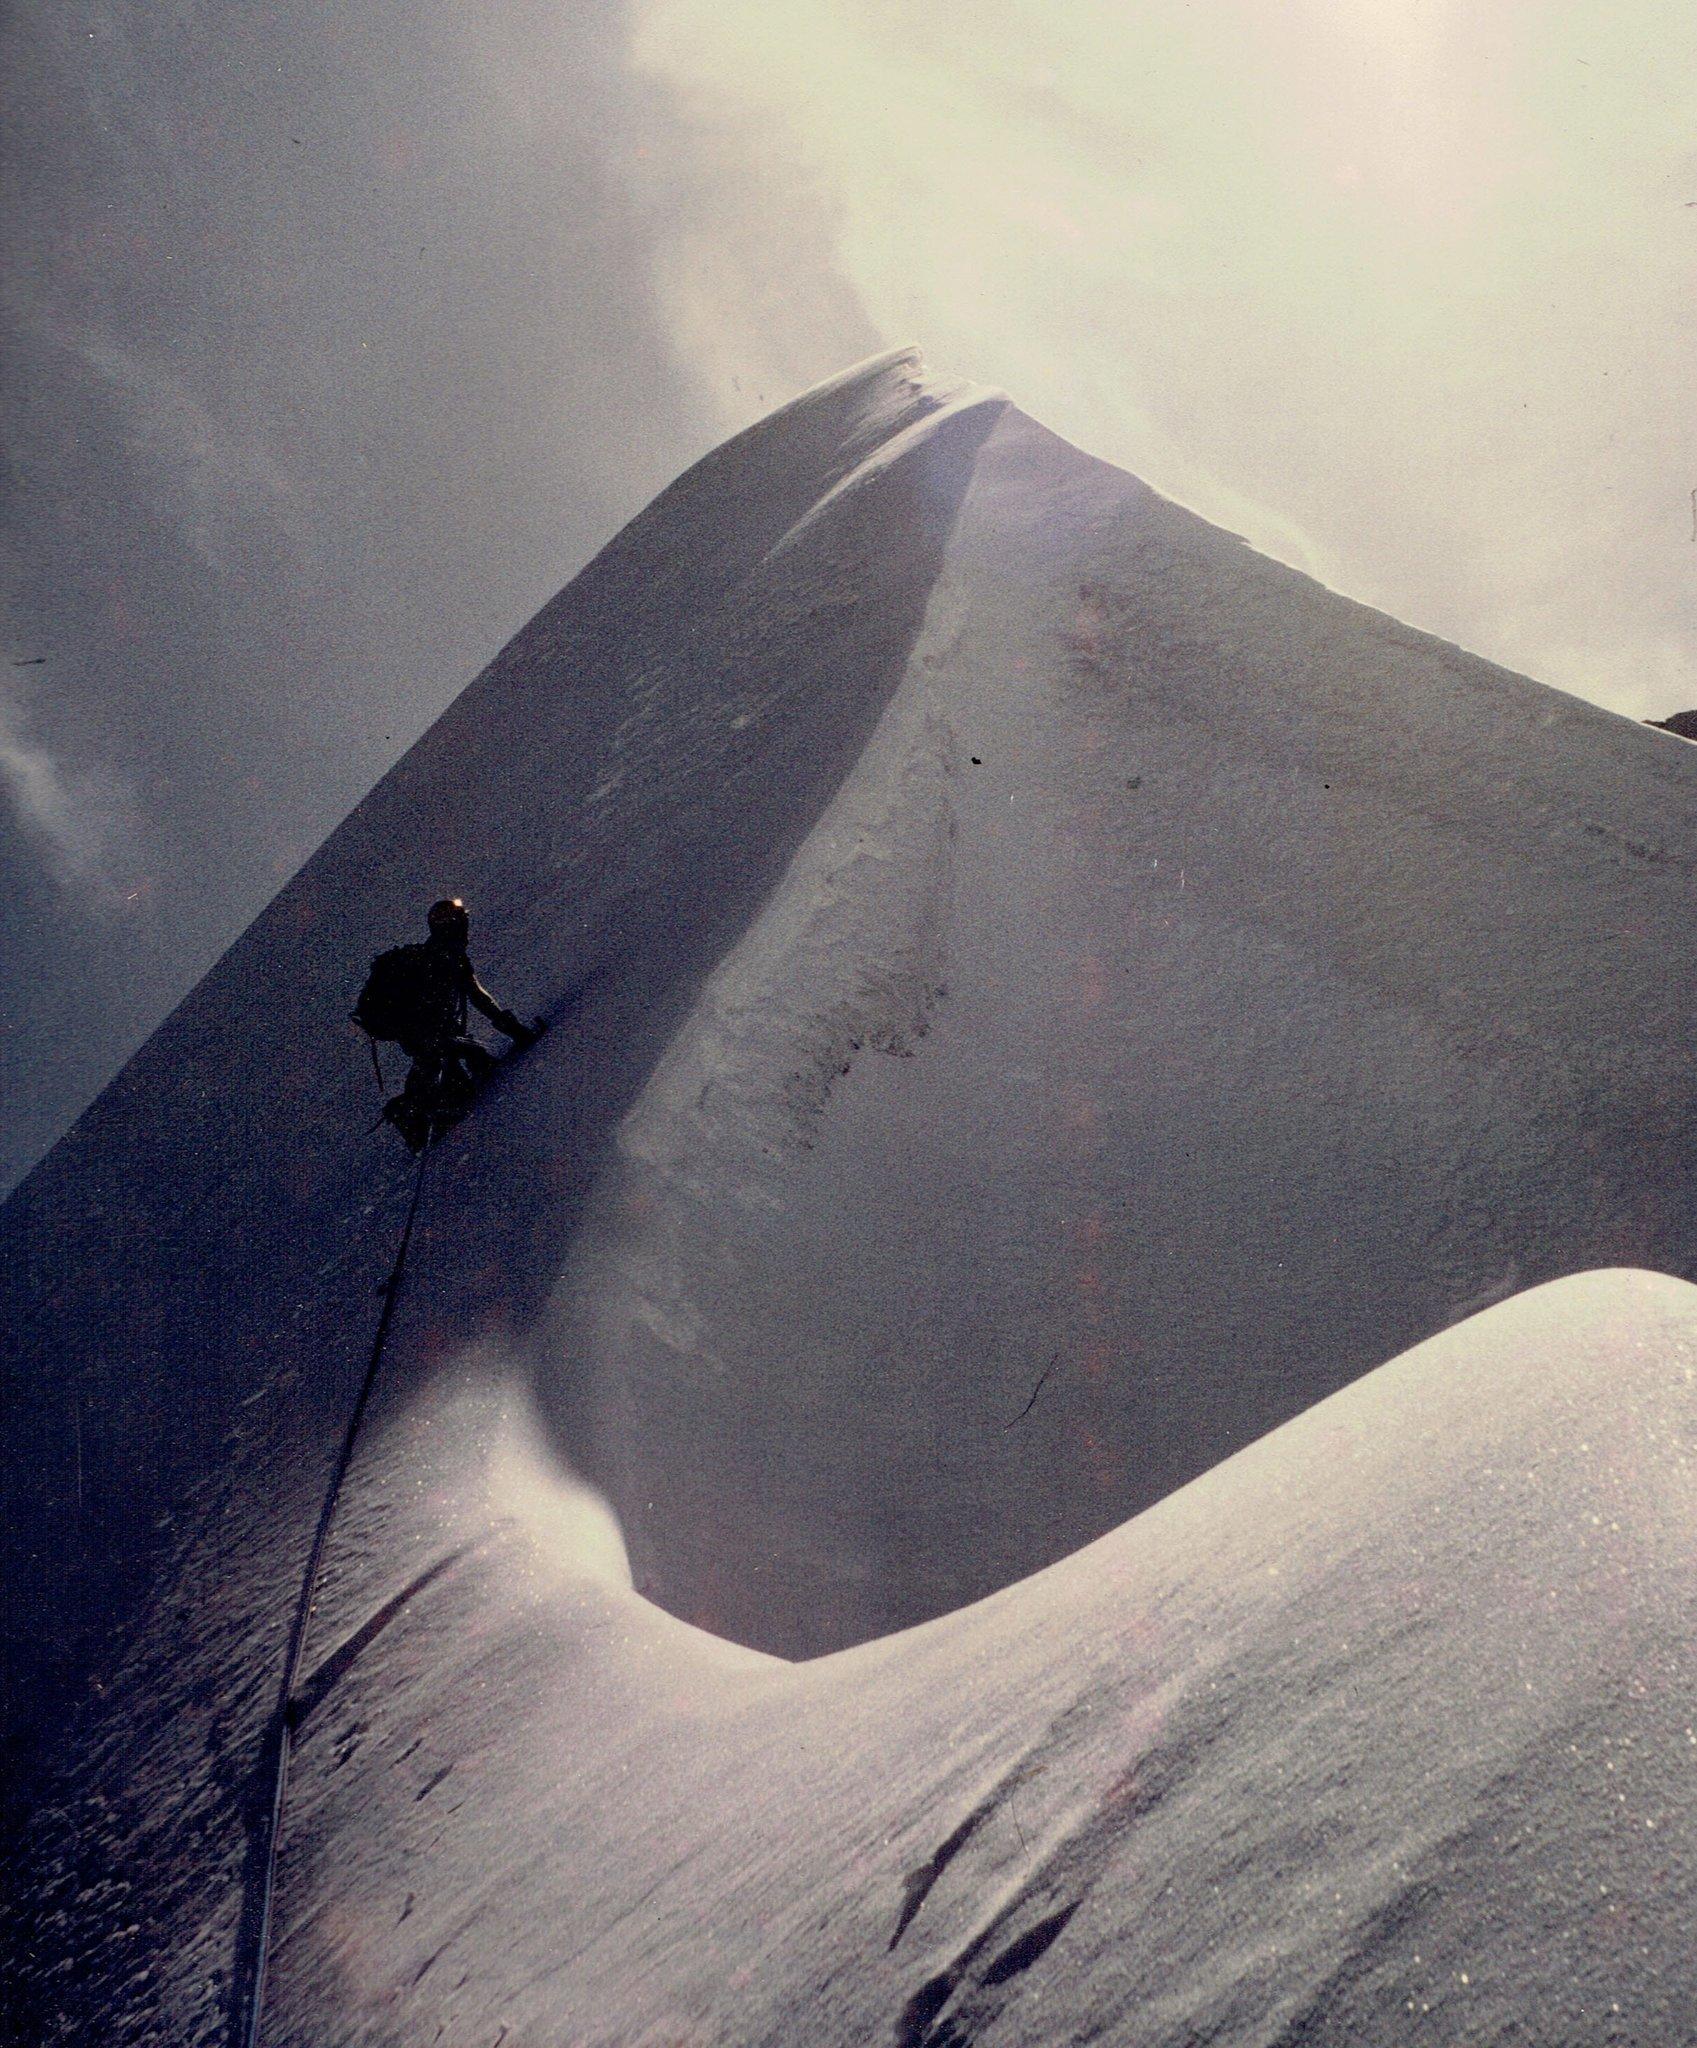 First Alpine season. Photo credit: Martin Scrowston